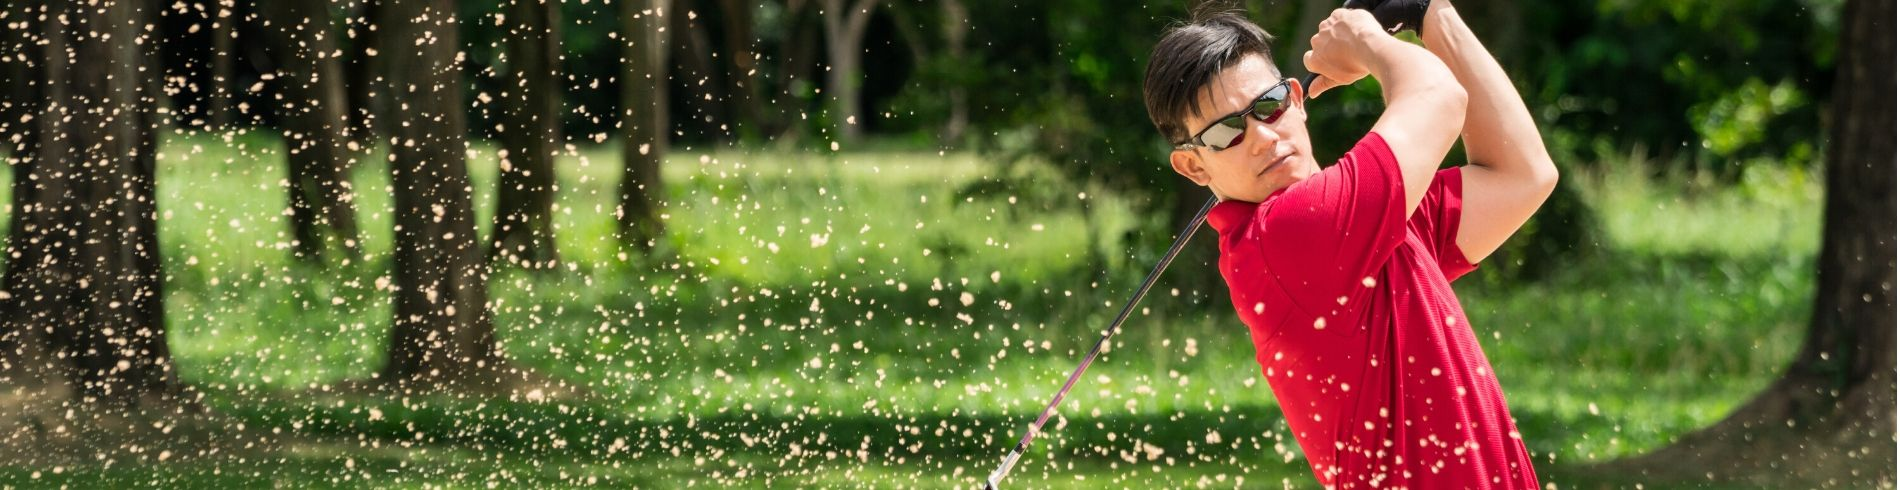 Golf_1900x490